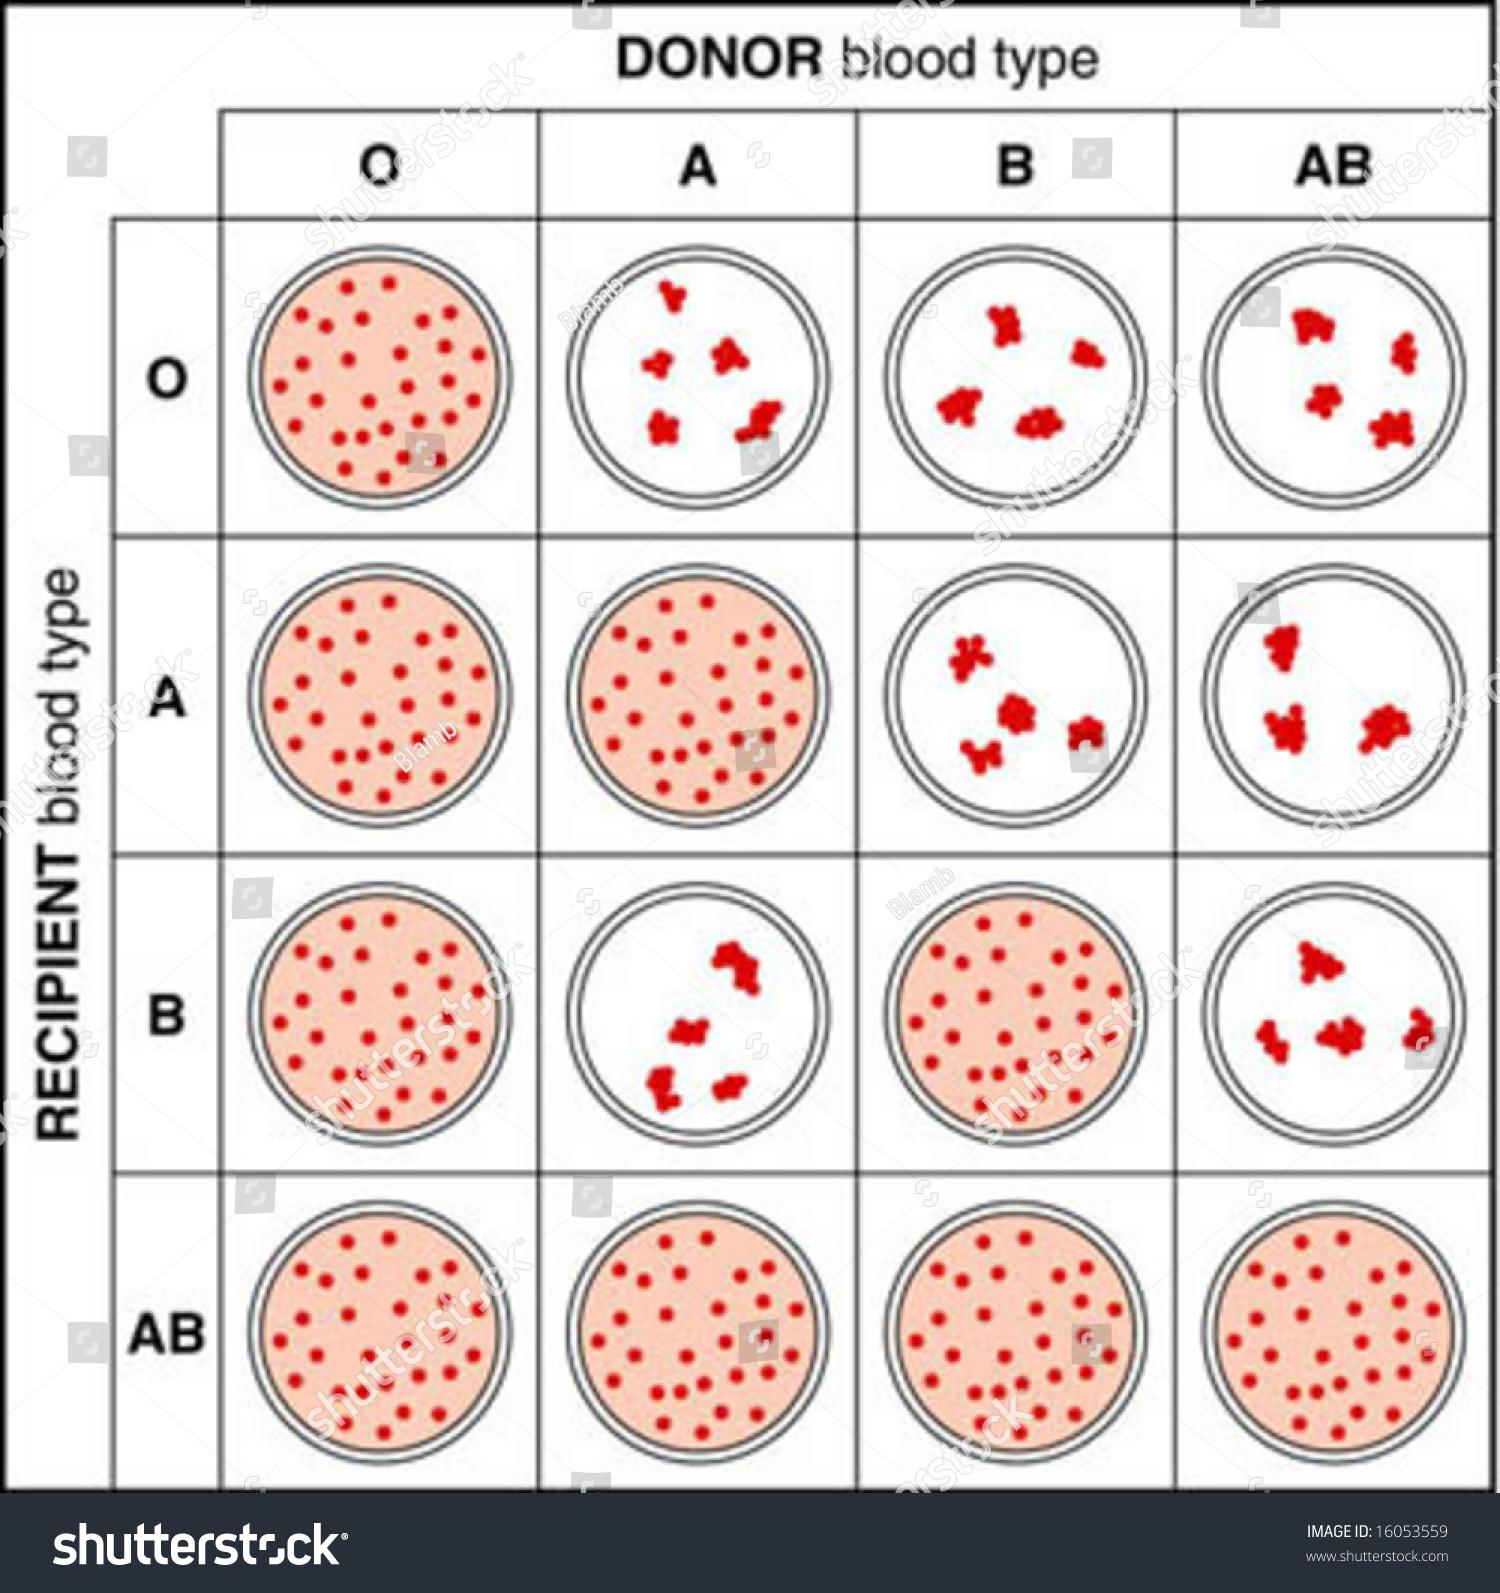 Illustration Showing Blood Crossmatching